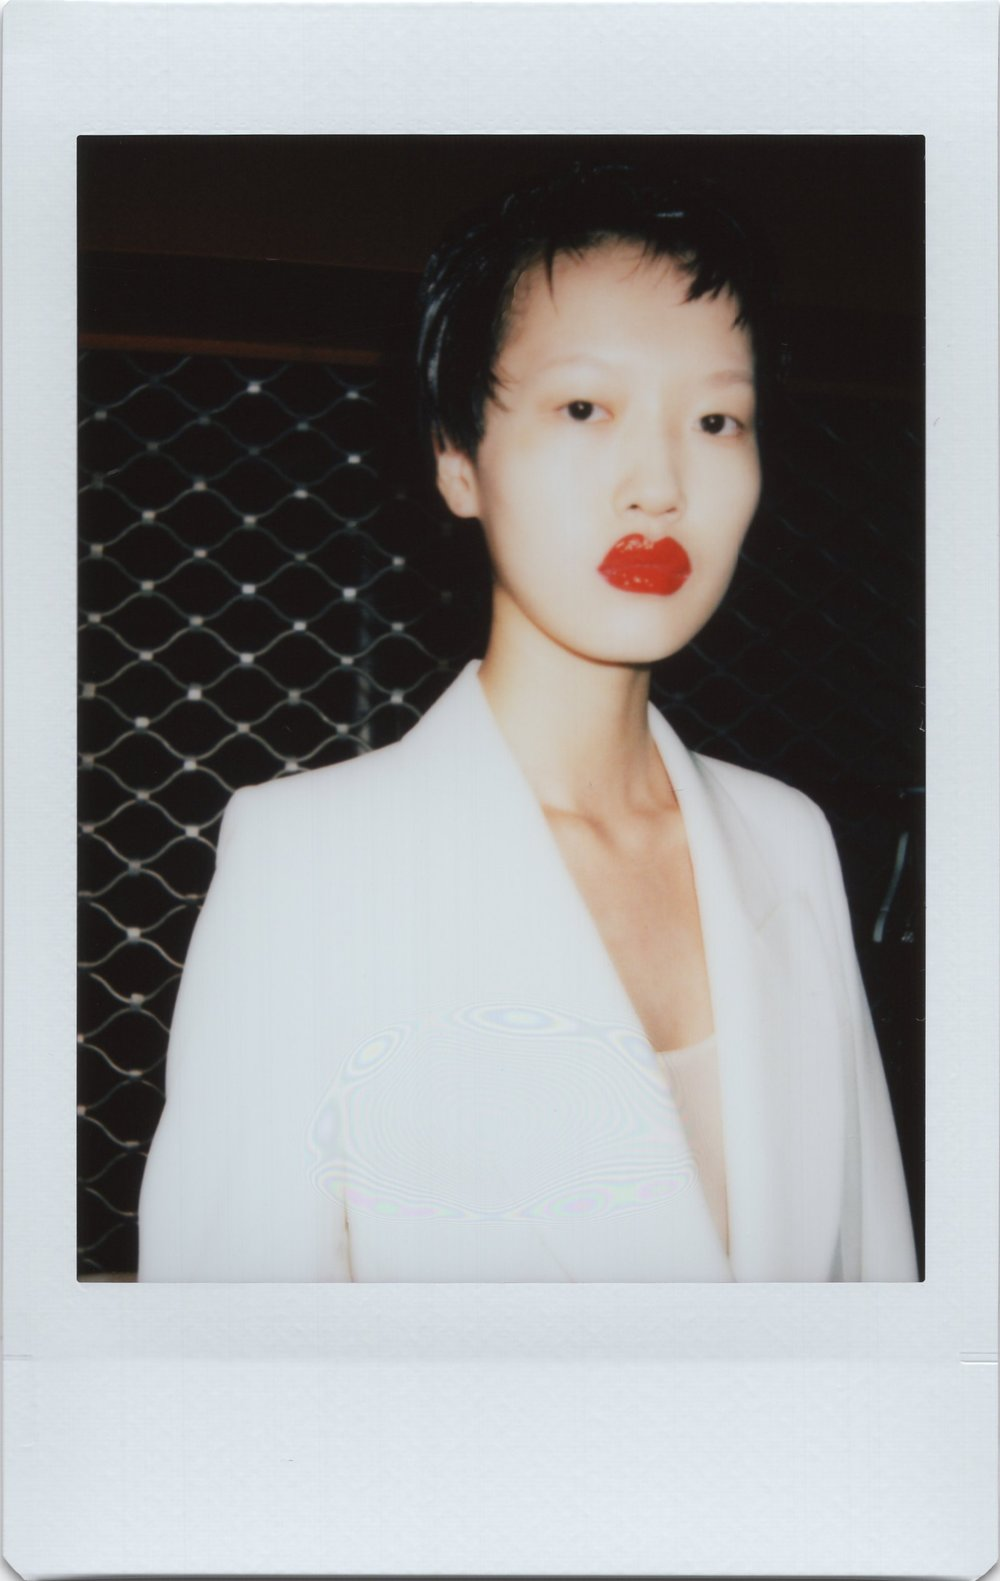 Mashama_Honigschreck_Backstage_Polaroid_5.jpg